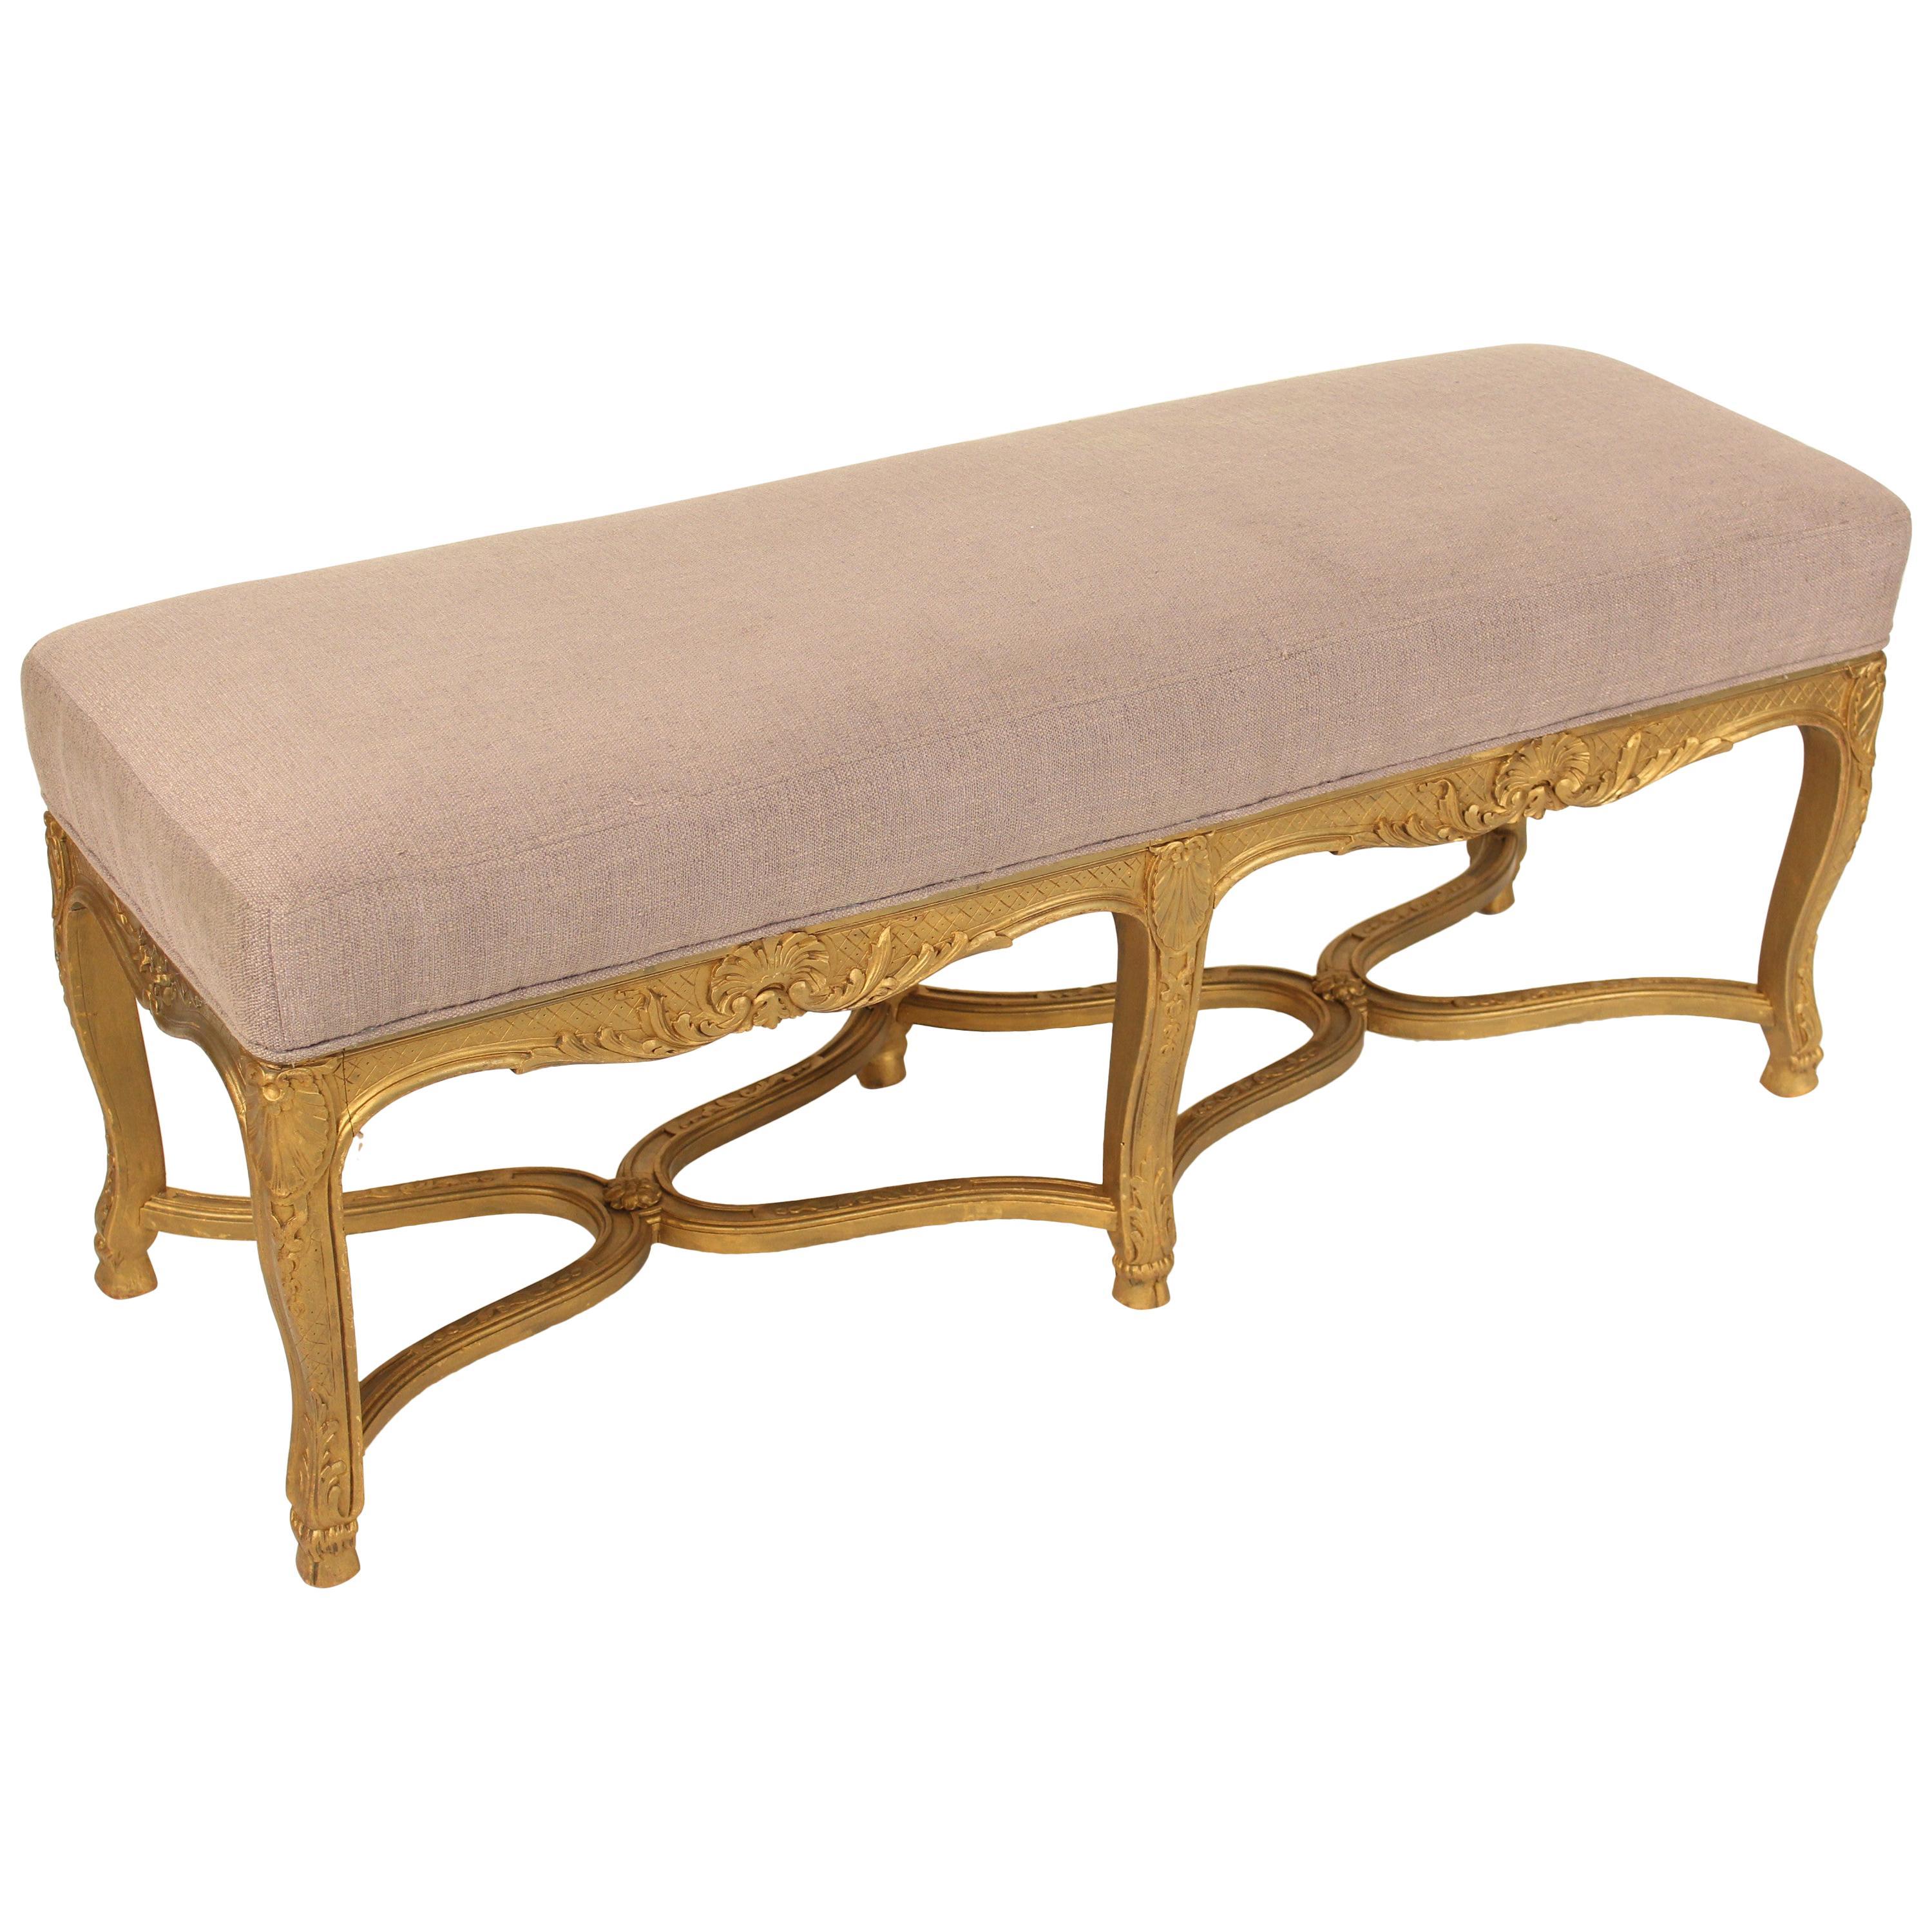 Louis XV Style Giltwood Bench